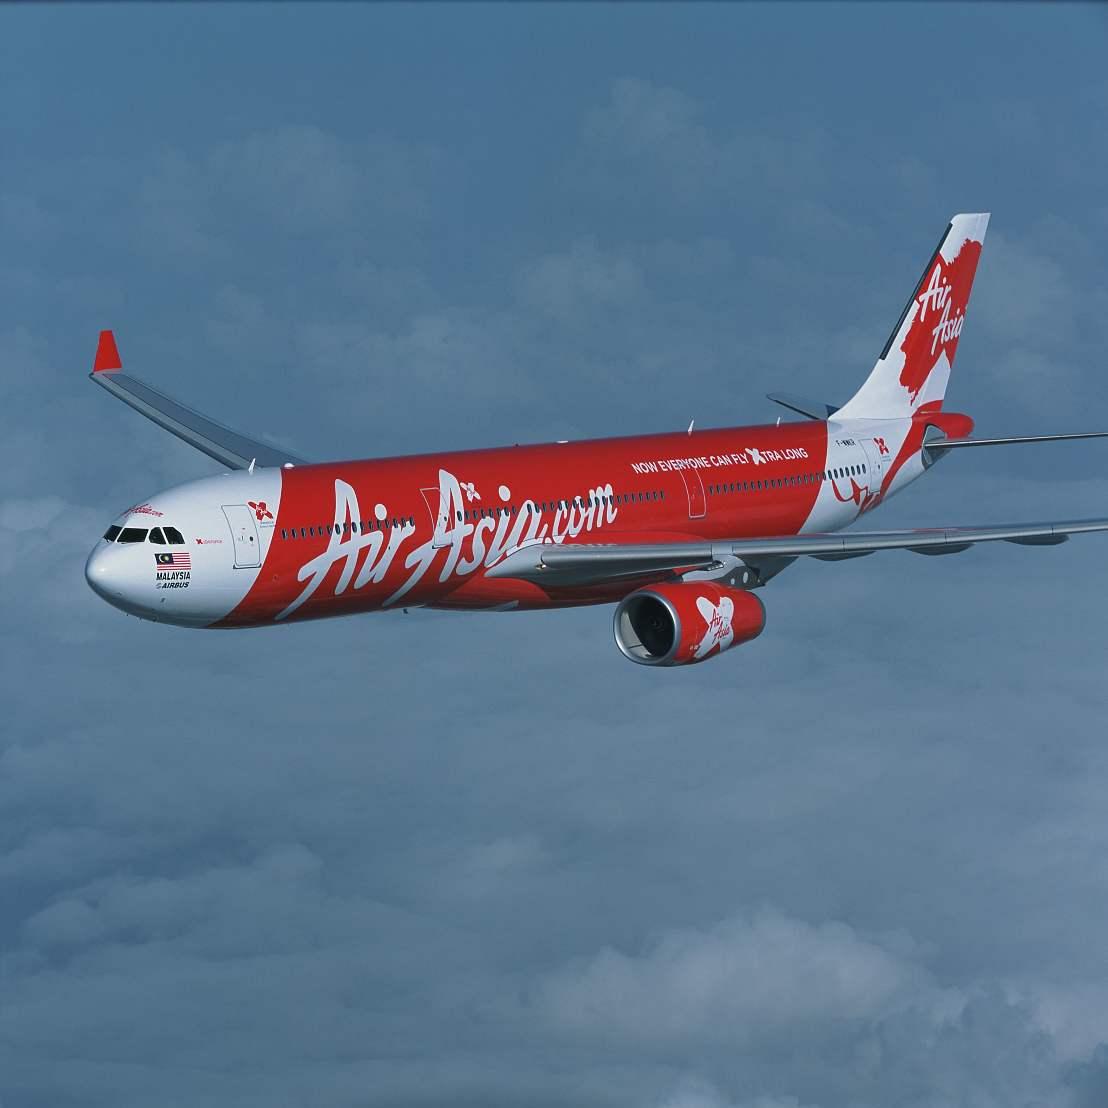 Safran wins AirAsia X MRO contract